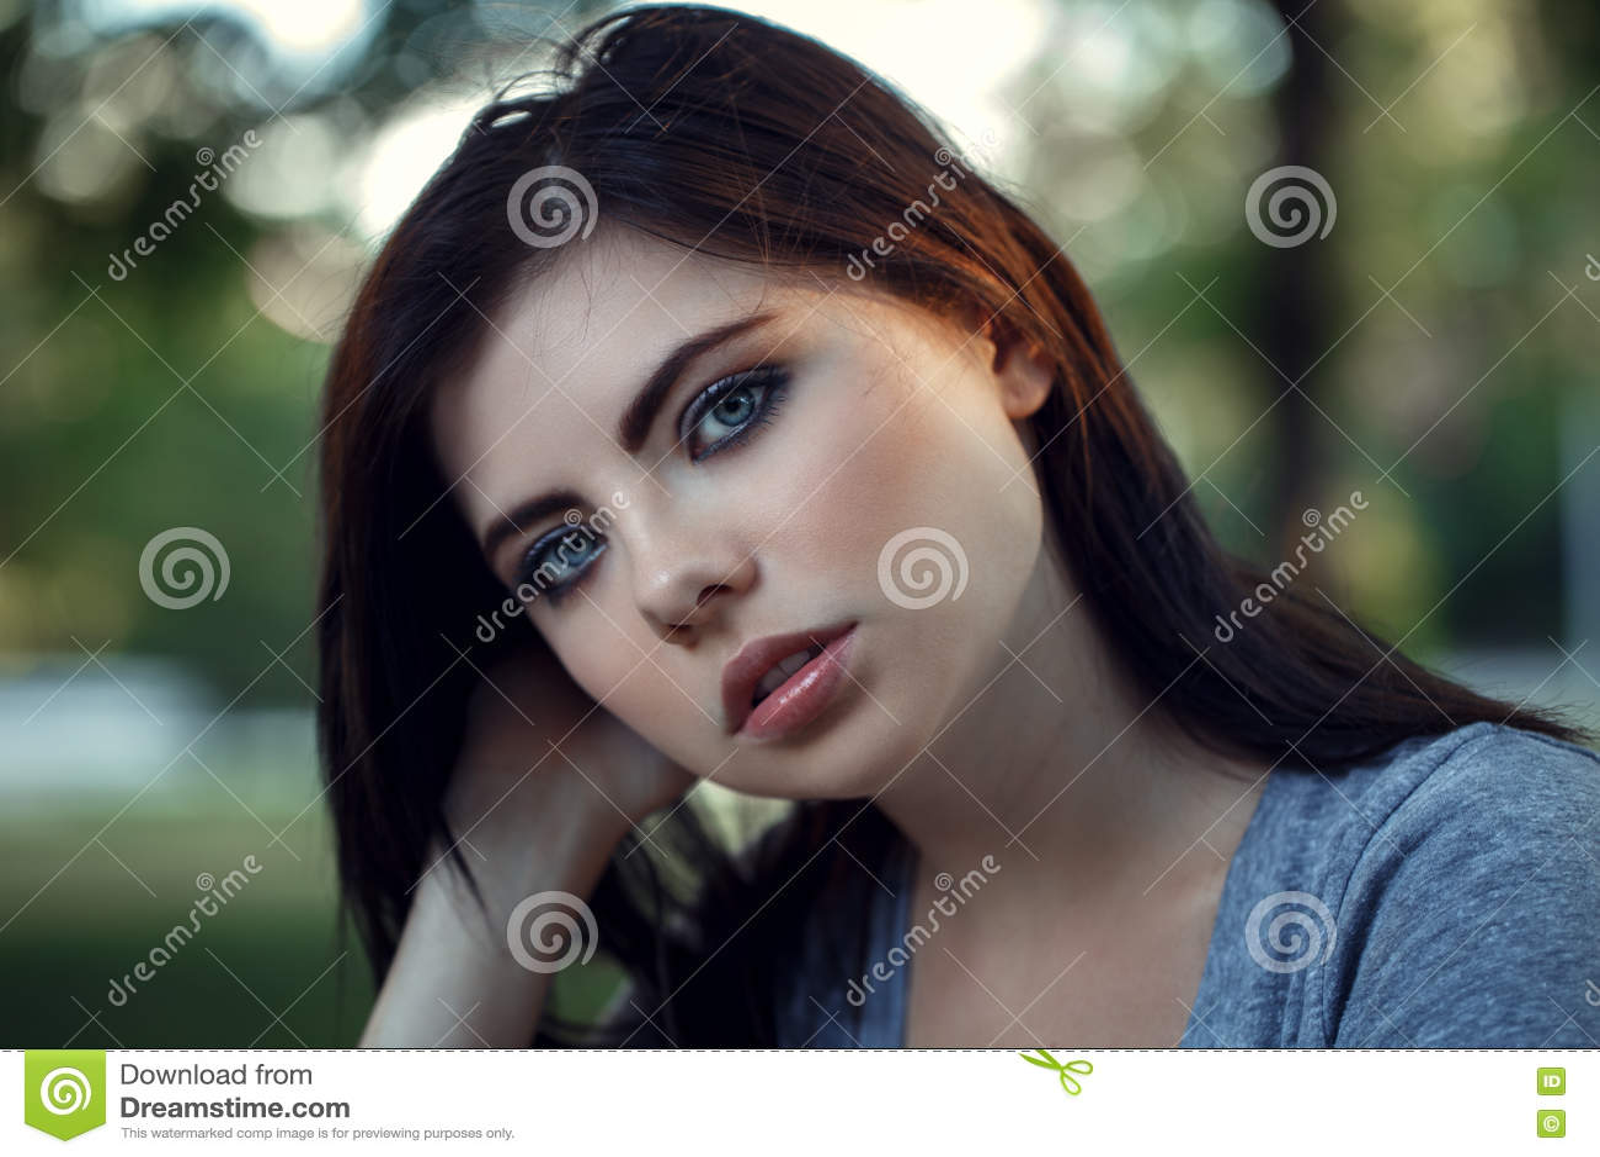 closeup portrait of beautiful young caucasian woman with